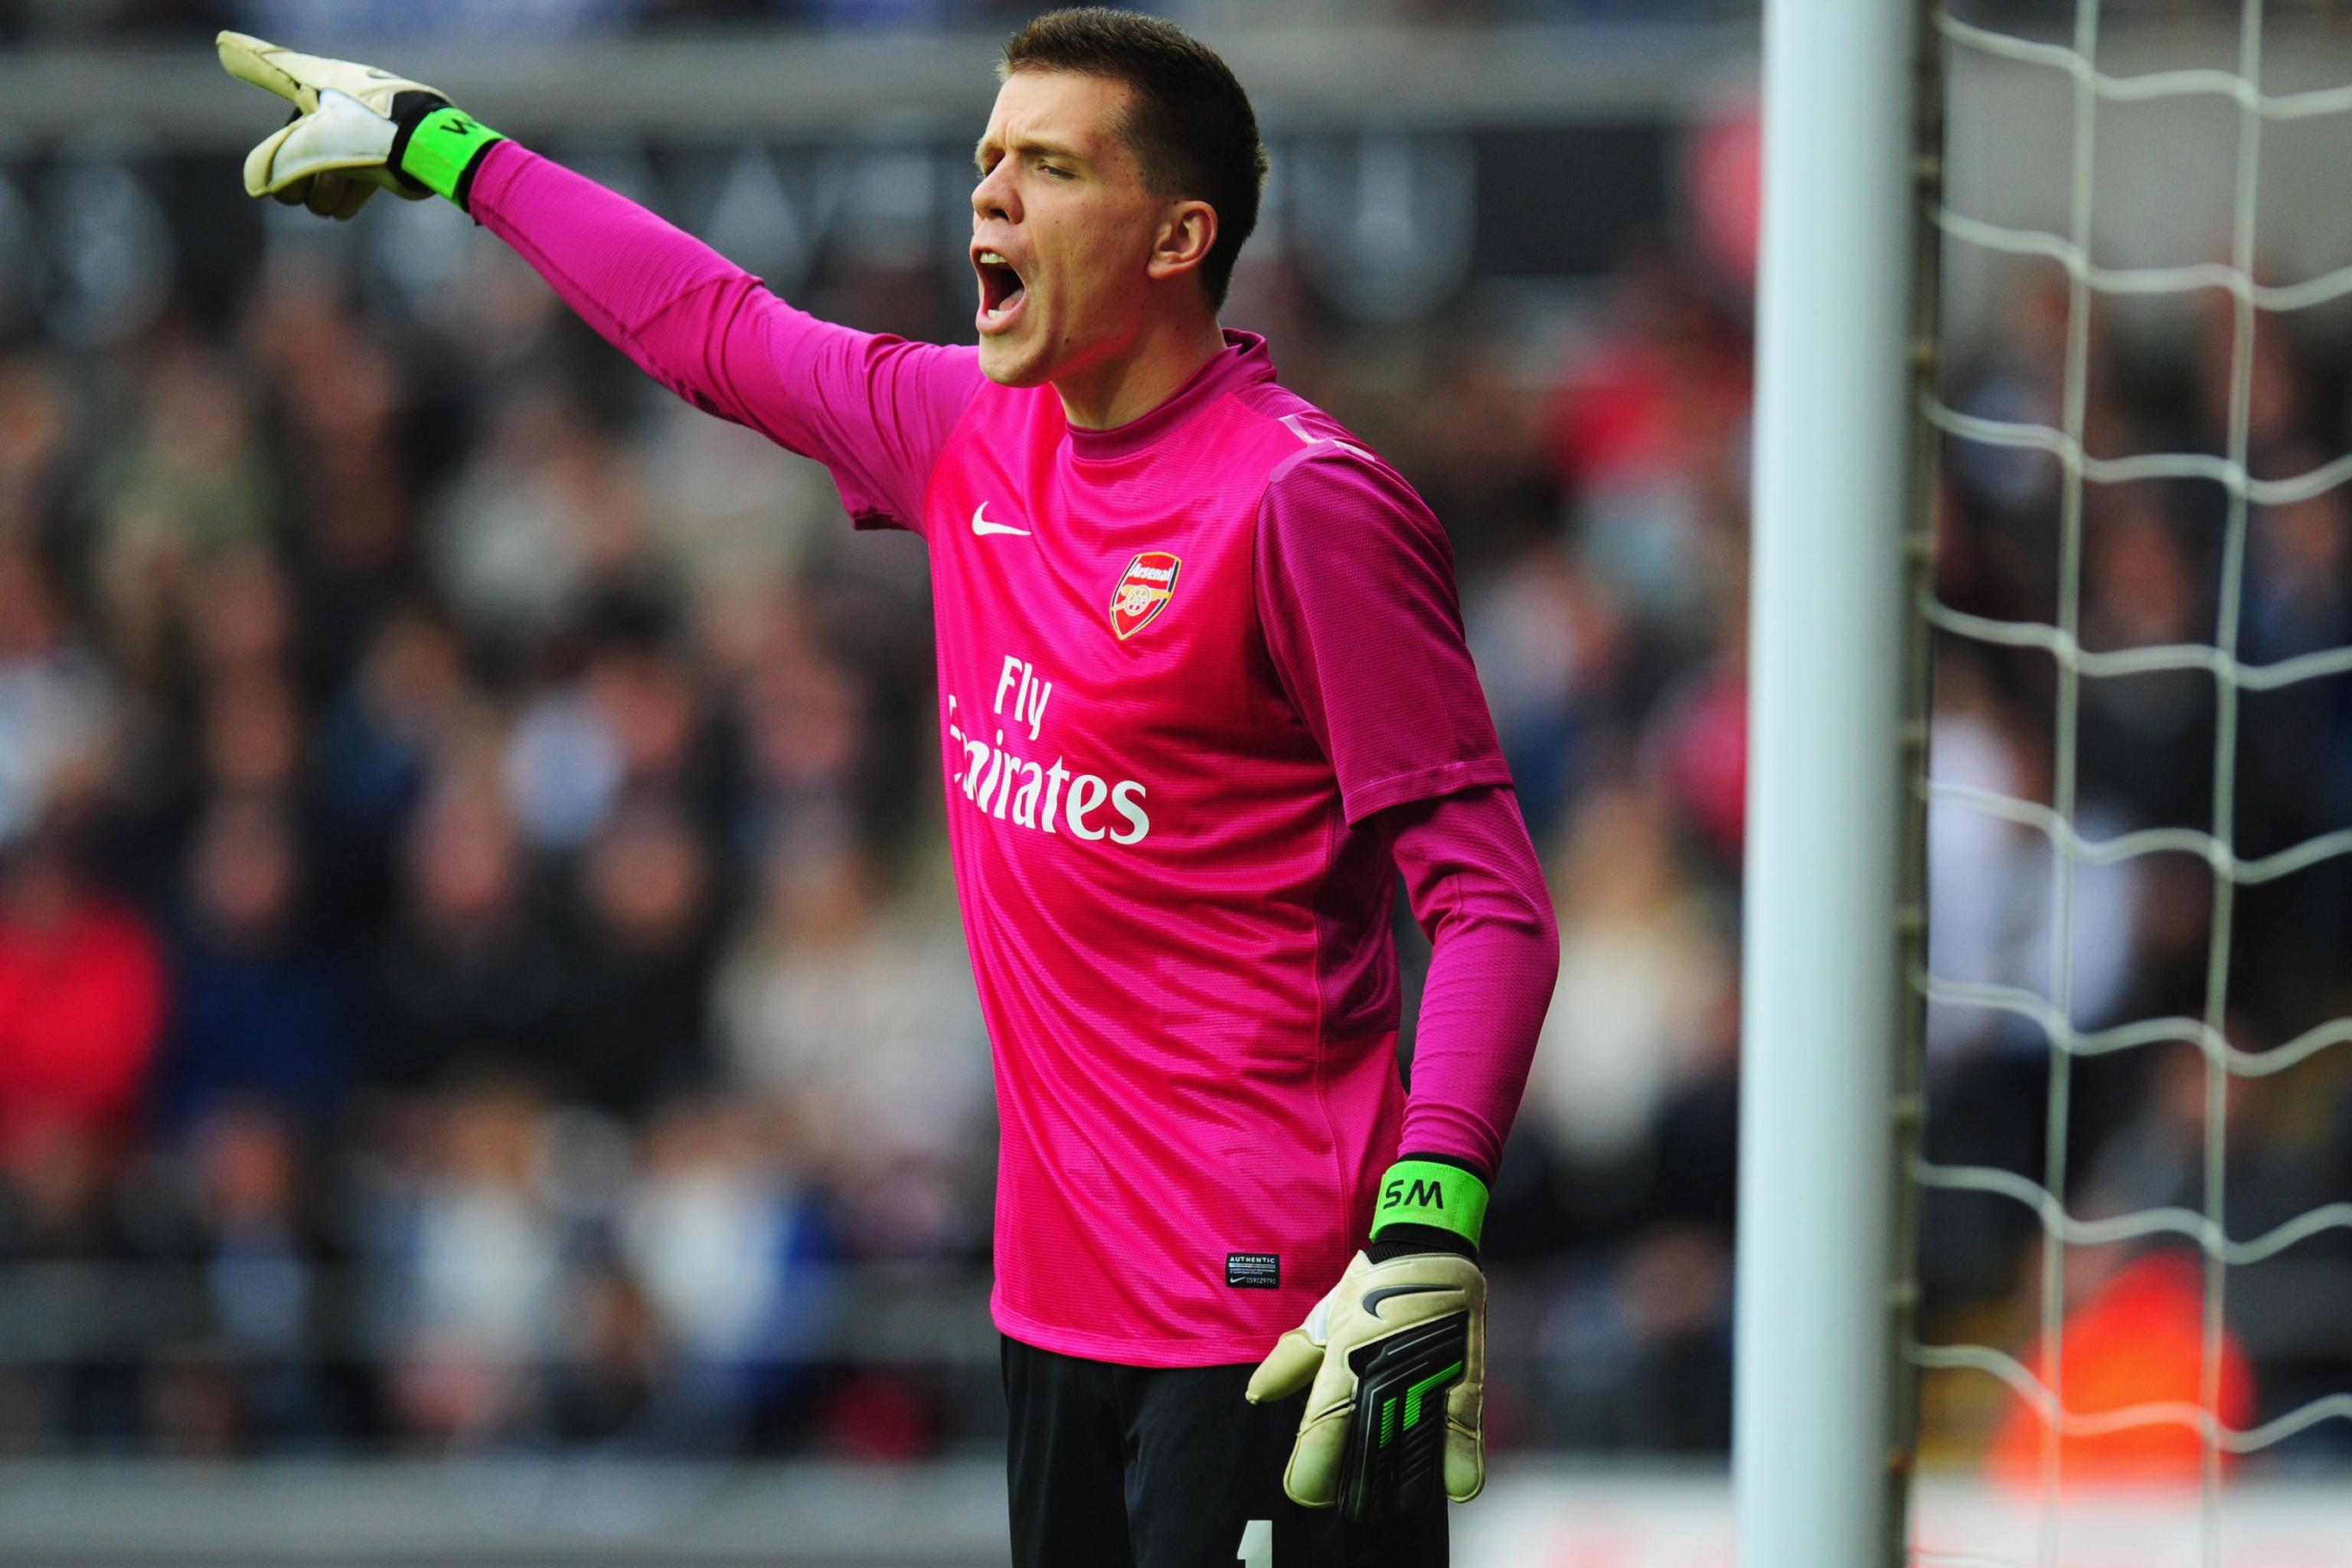 Szczęsny at Arsenal